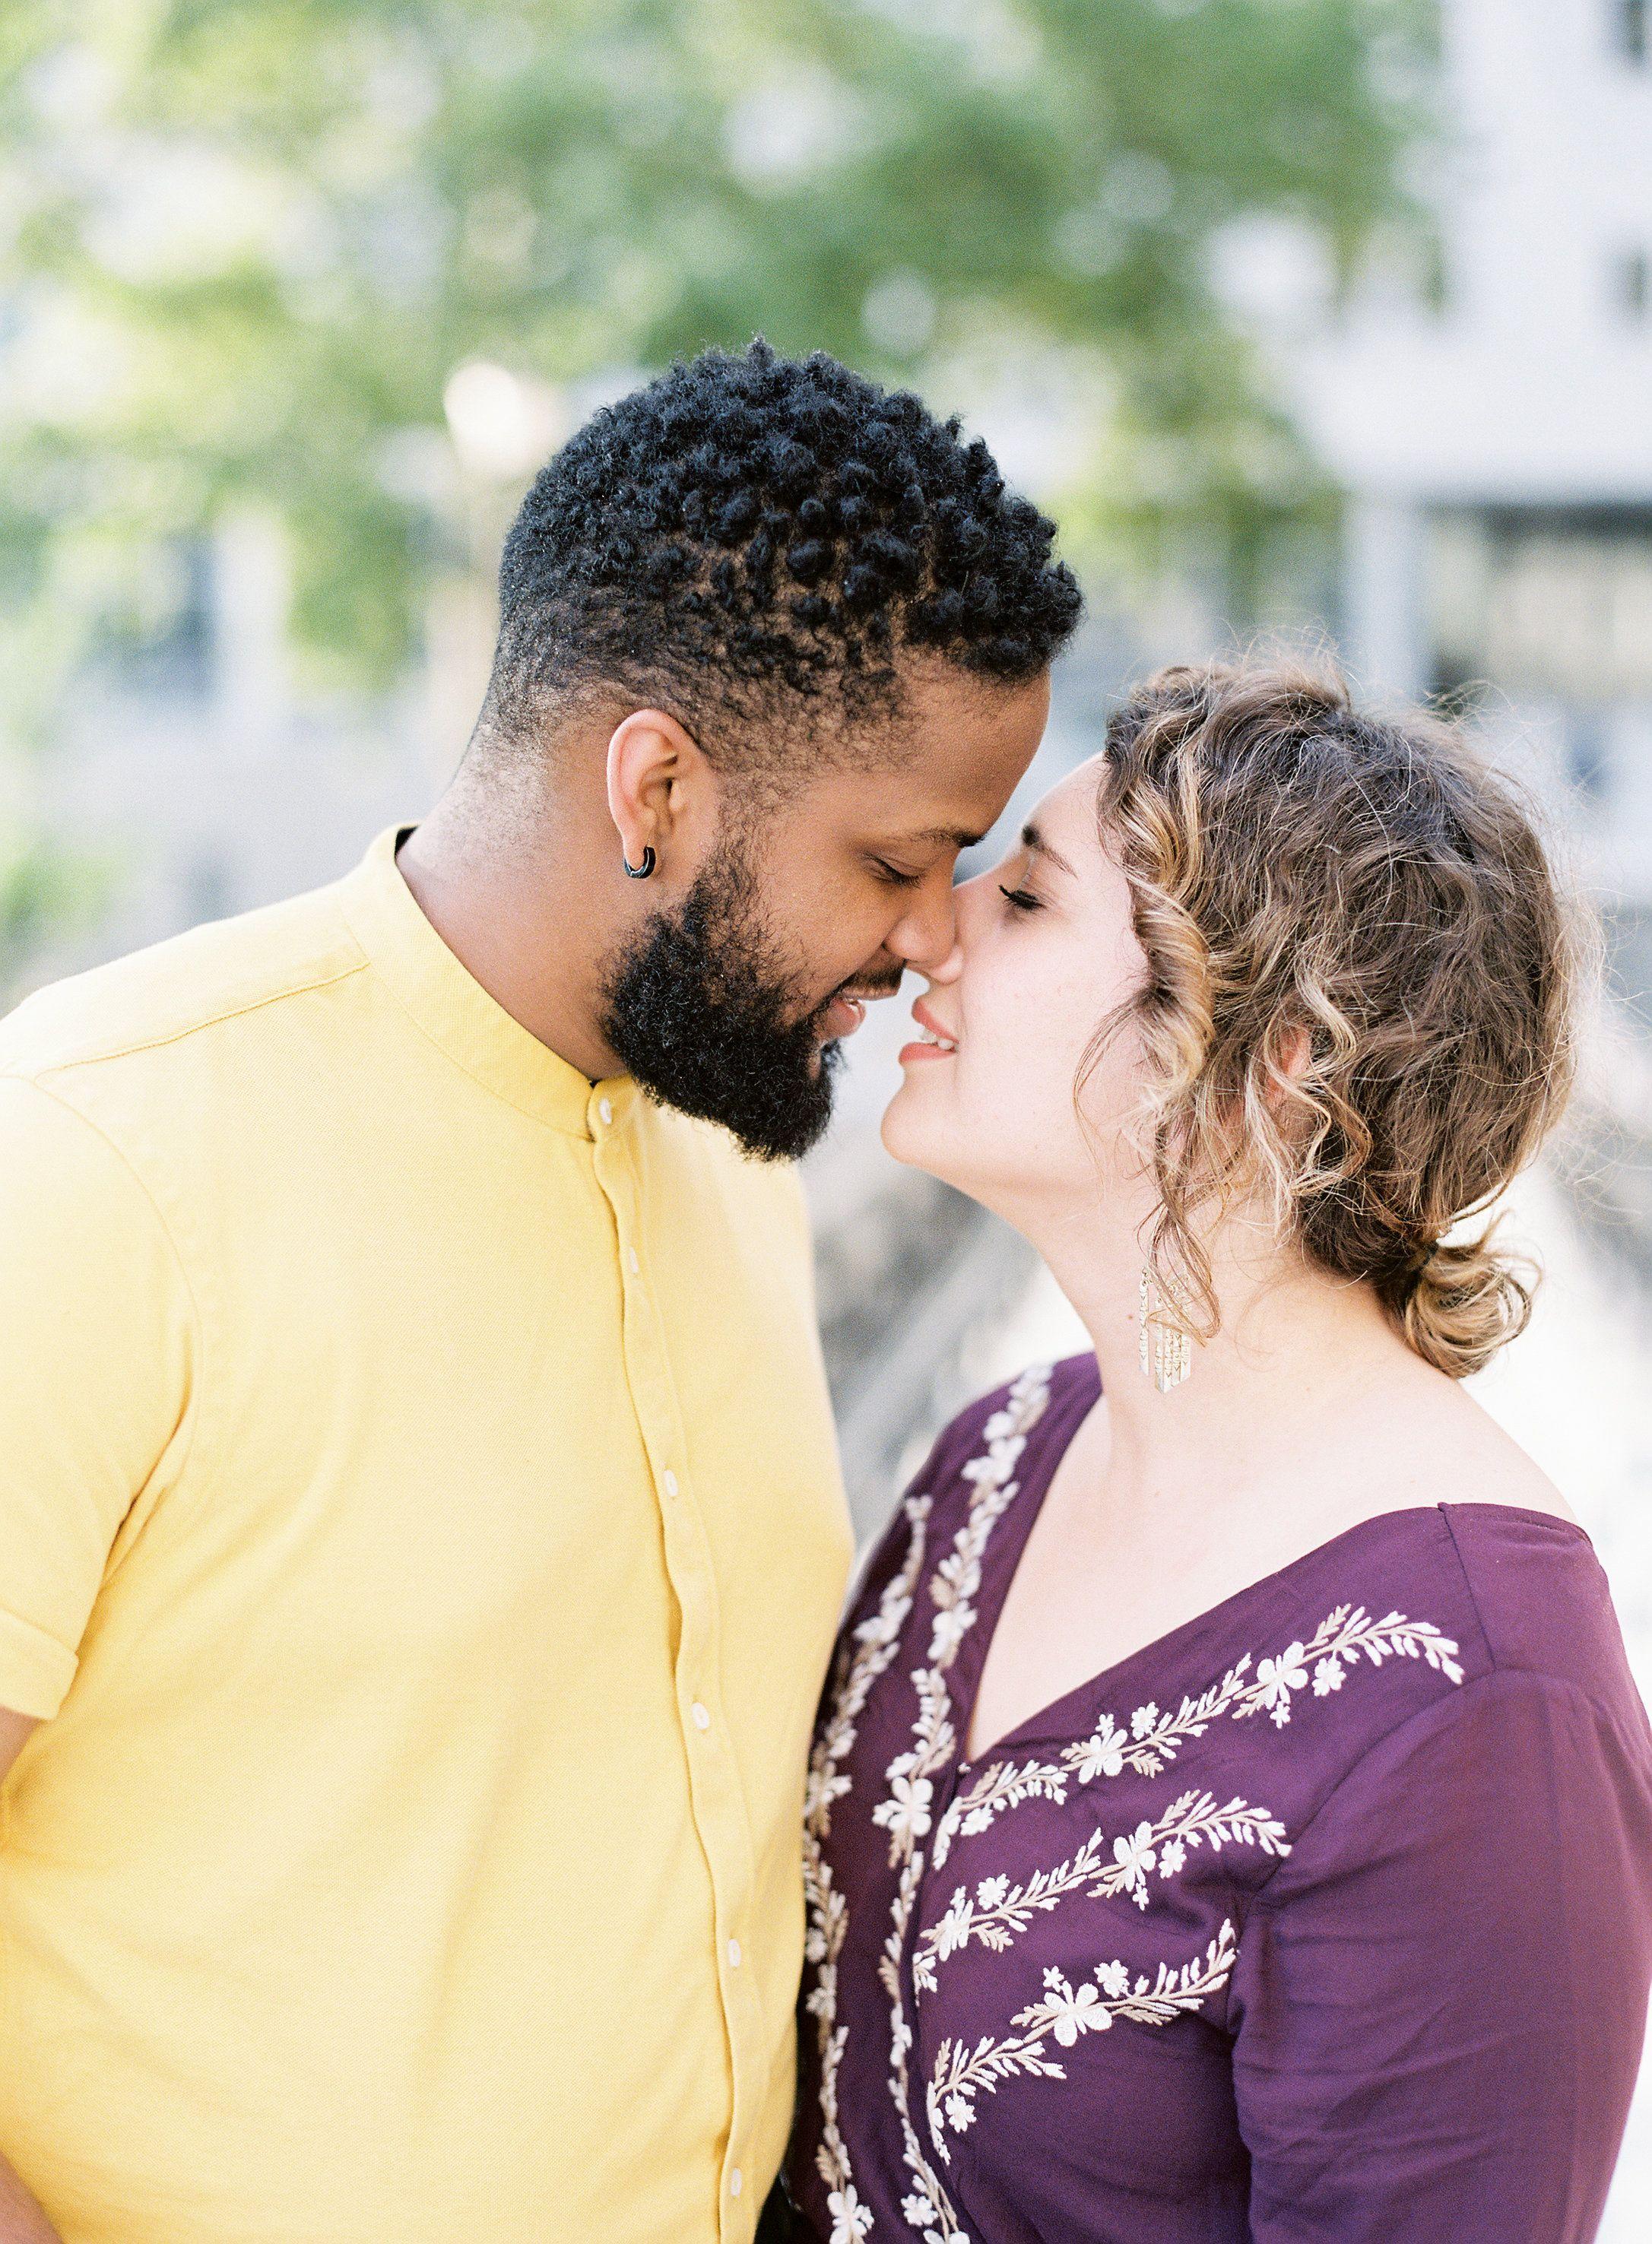 Interracial dating Columbus Ohio om meg online dating profil